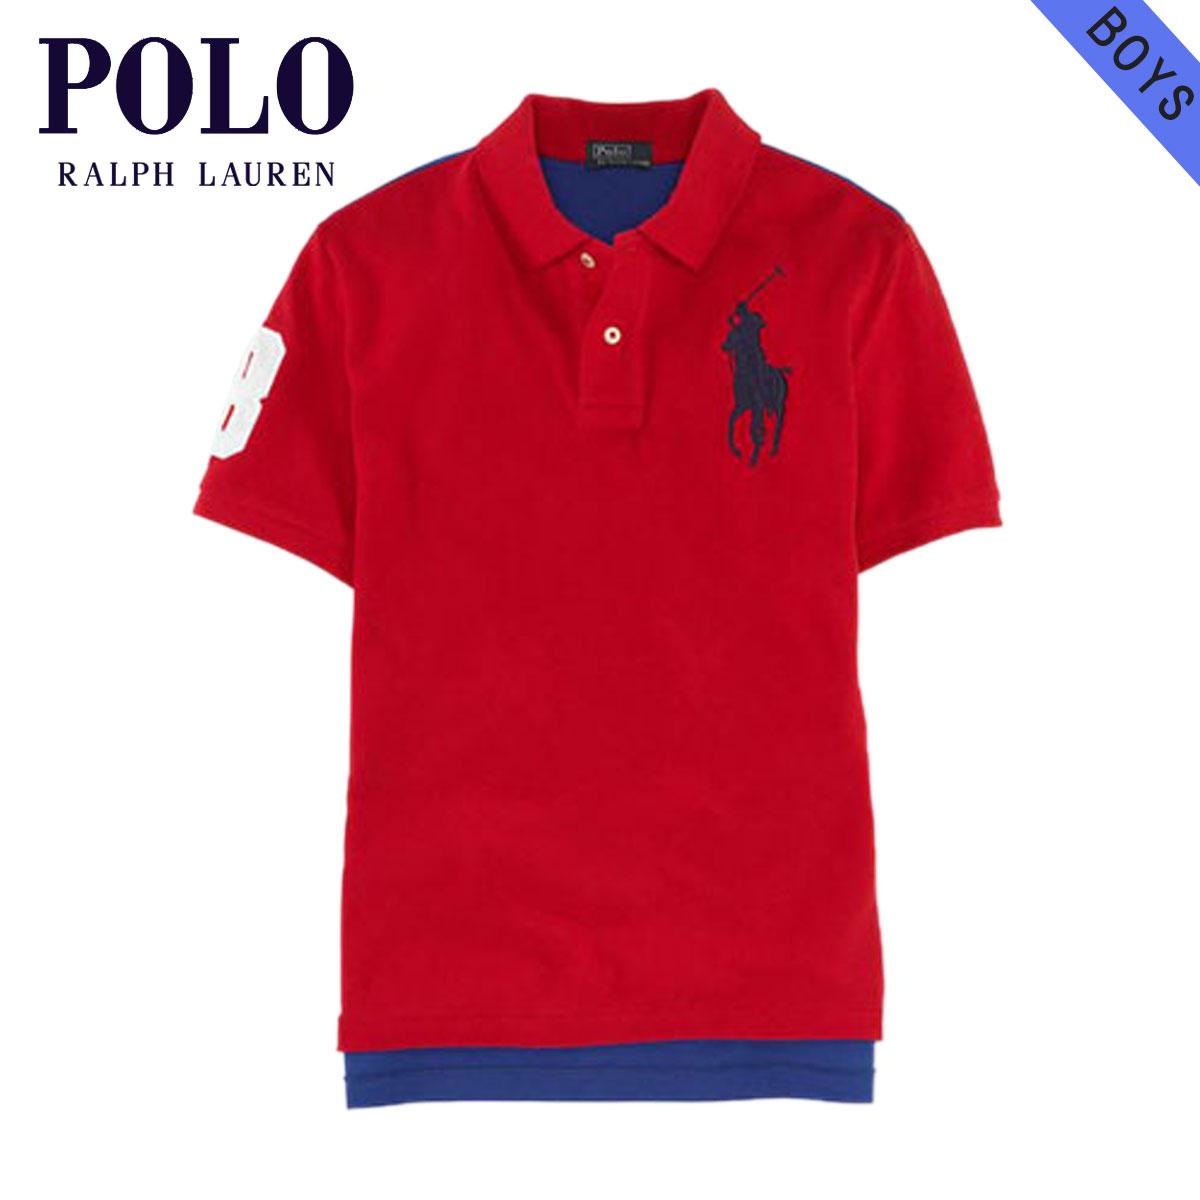 b5d2eb0f1b7ee Poloralflorenkids POLO RALPH LAUREN CHILDREN genuine kids clothing boys  Polo Shirt Big Pony Mesh Polo  18121236 RED 10P22Jul14